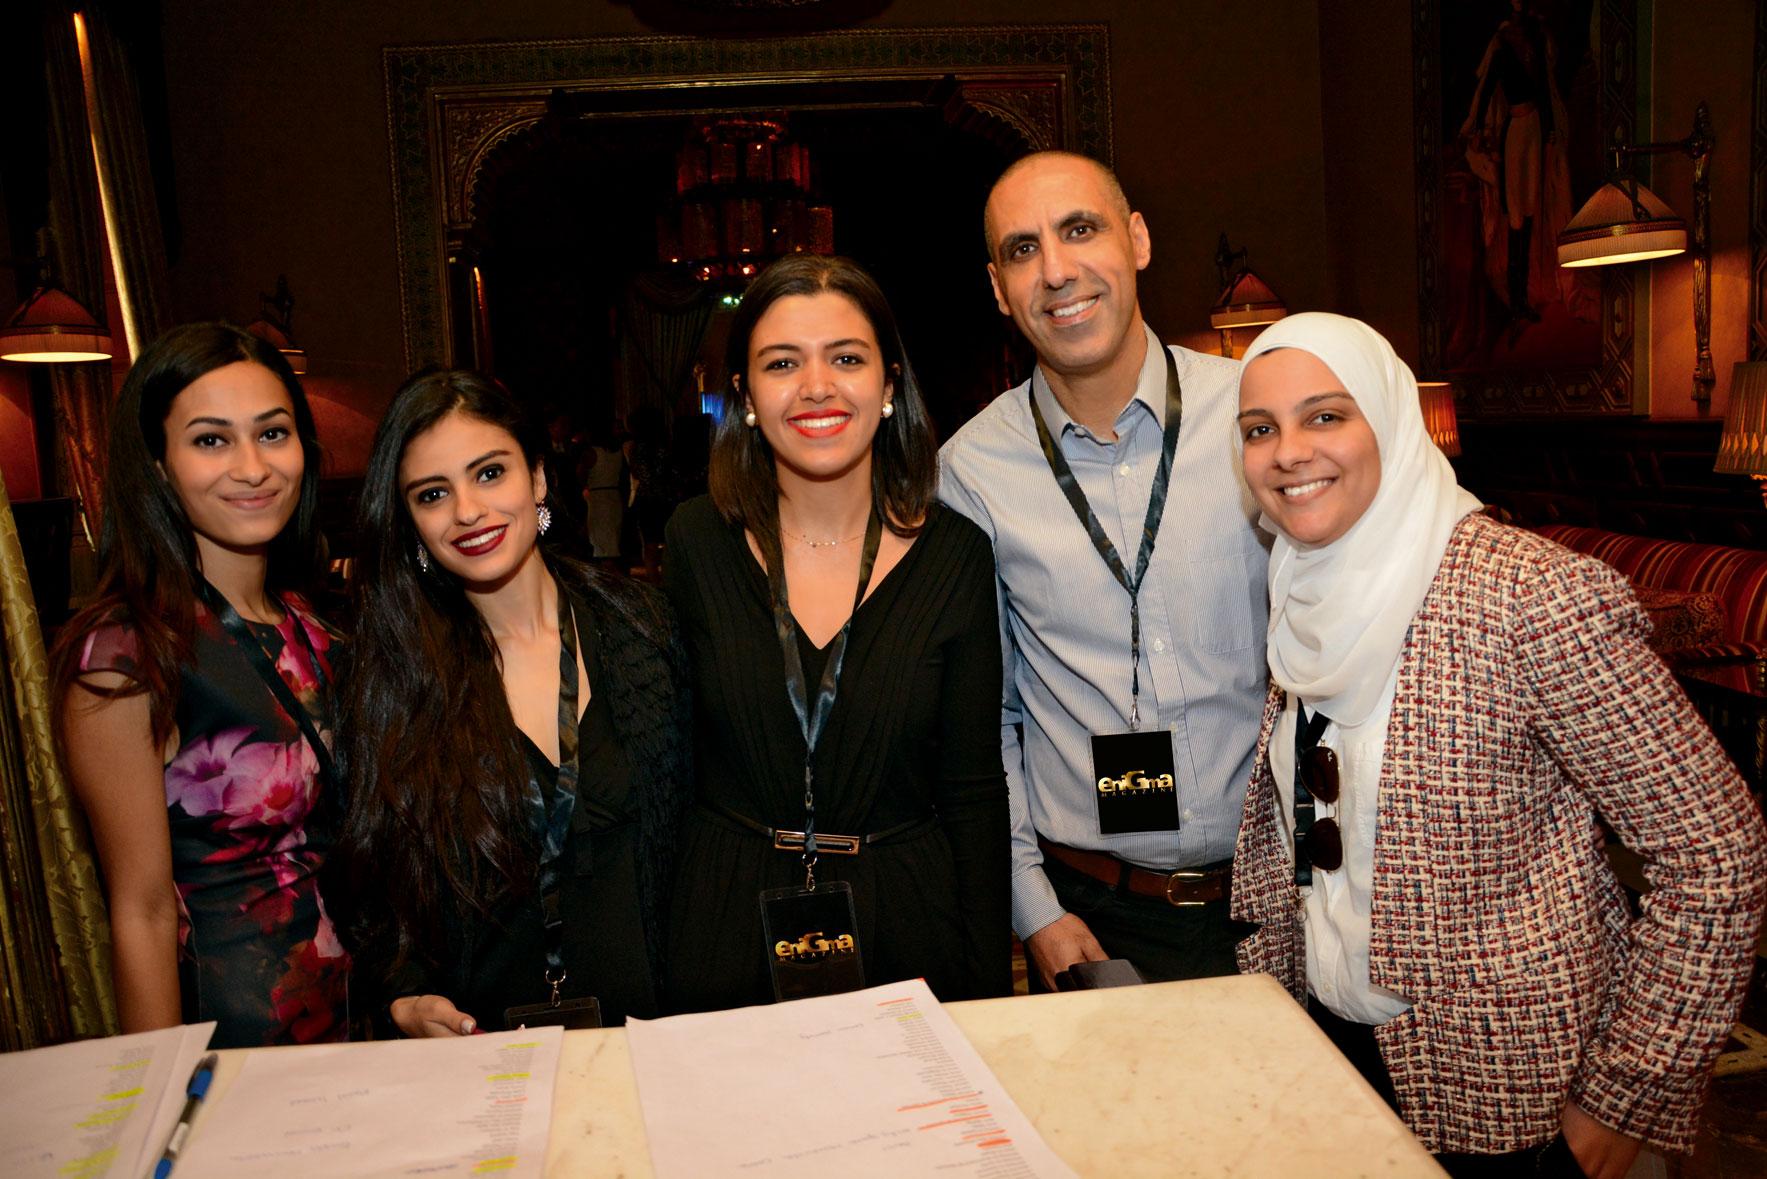 Ms.-Shereen-Kamal,-Ms.-Salma-Hussein,-Ms.-Yosra-Shohayeb,-Mr.-Mohamed-Abdel-Moneim-&-Ms.-Omnia-Zaied